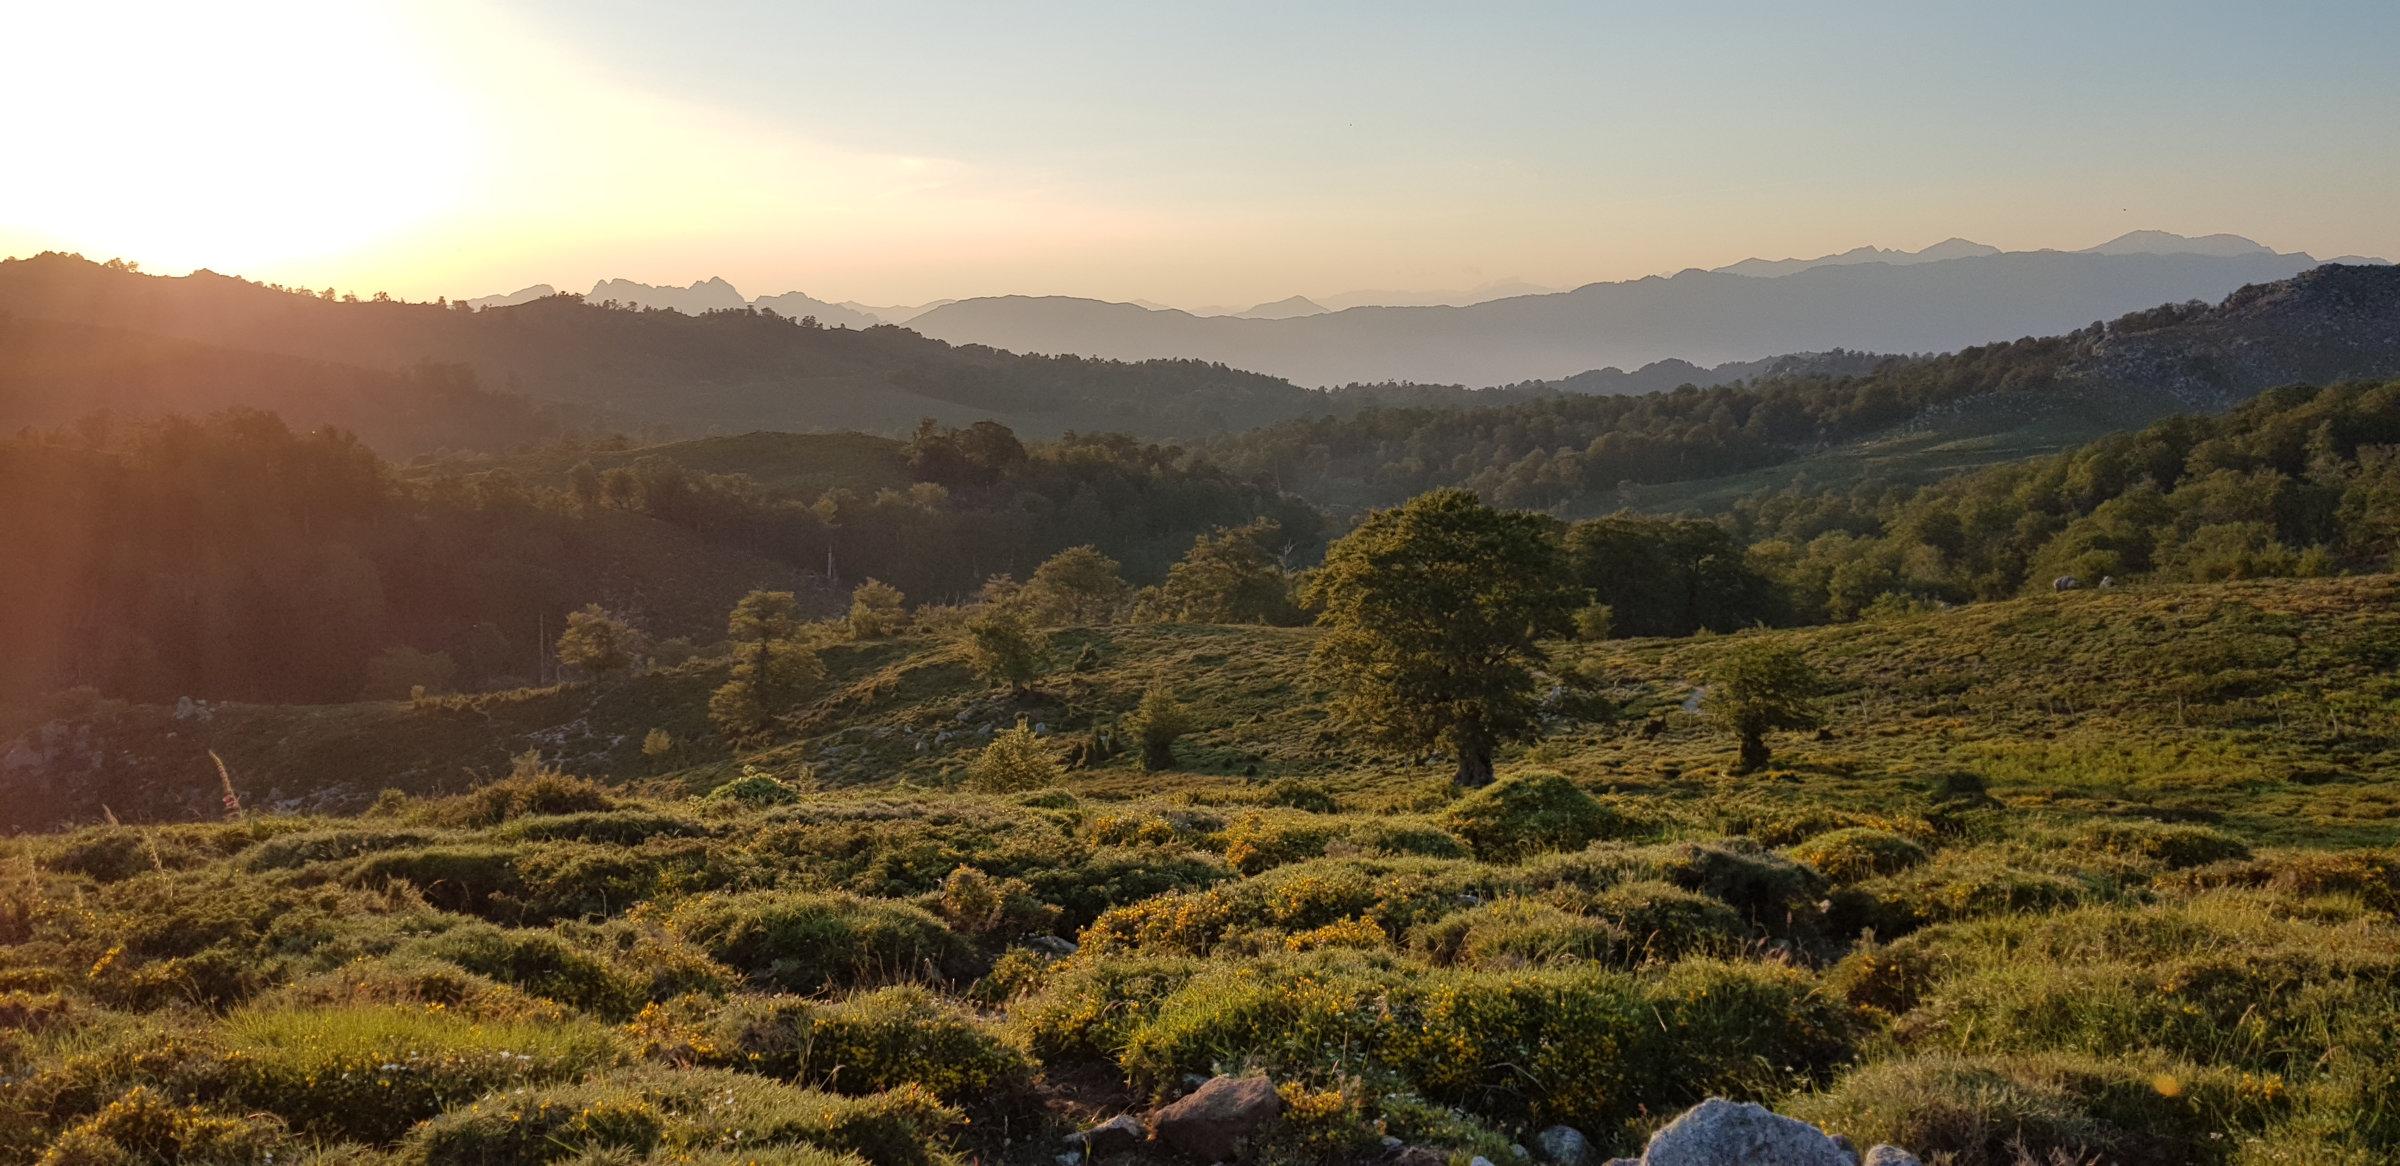 Abendstimmung an der Bergerie de Croci, Korsika, GR20 Weitwanderweg, Wandern, Berge, Frankreich